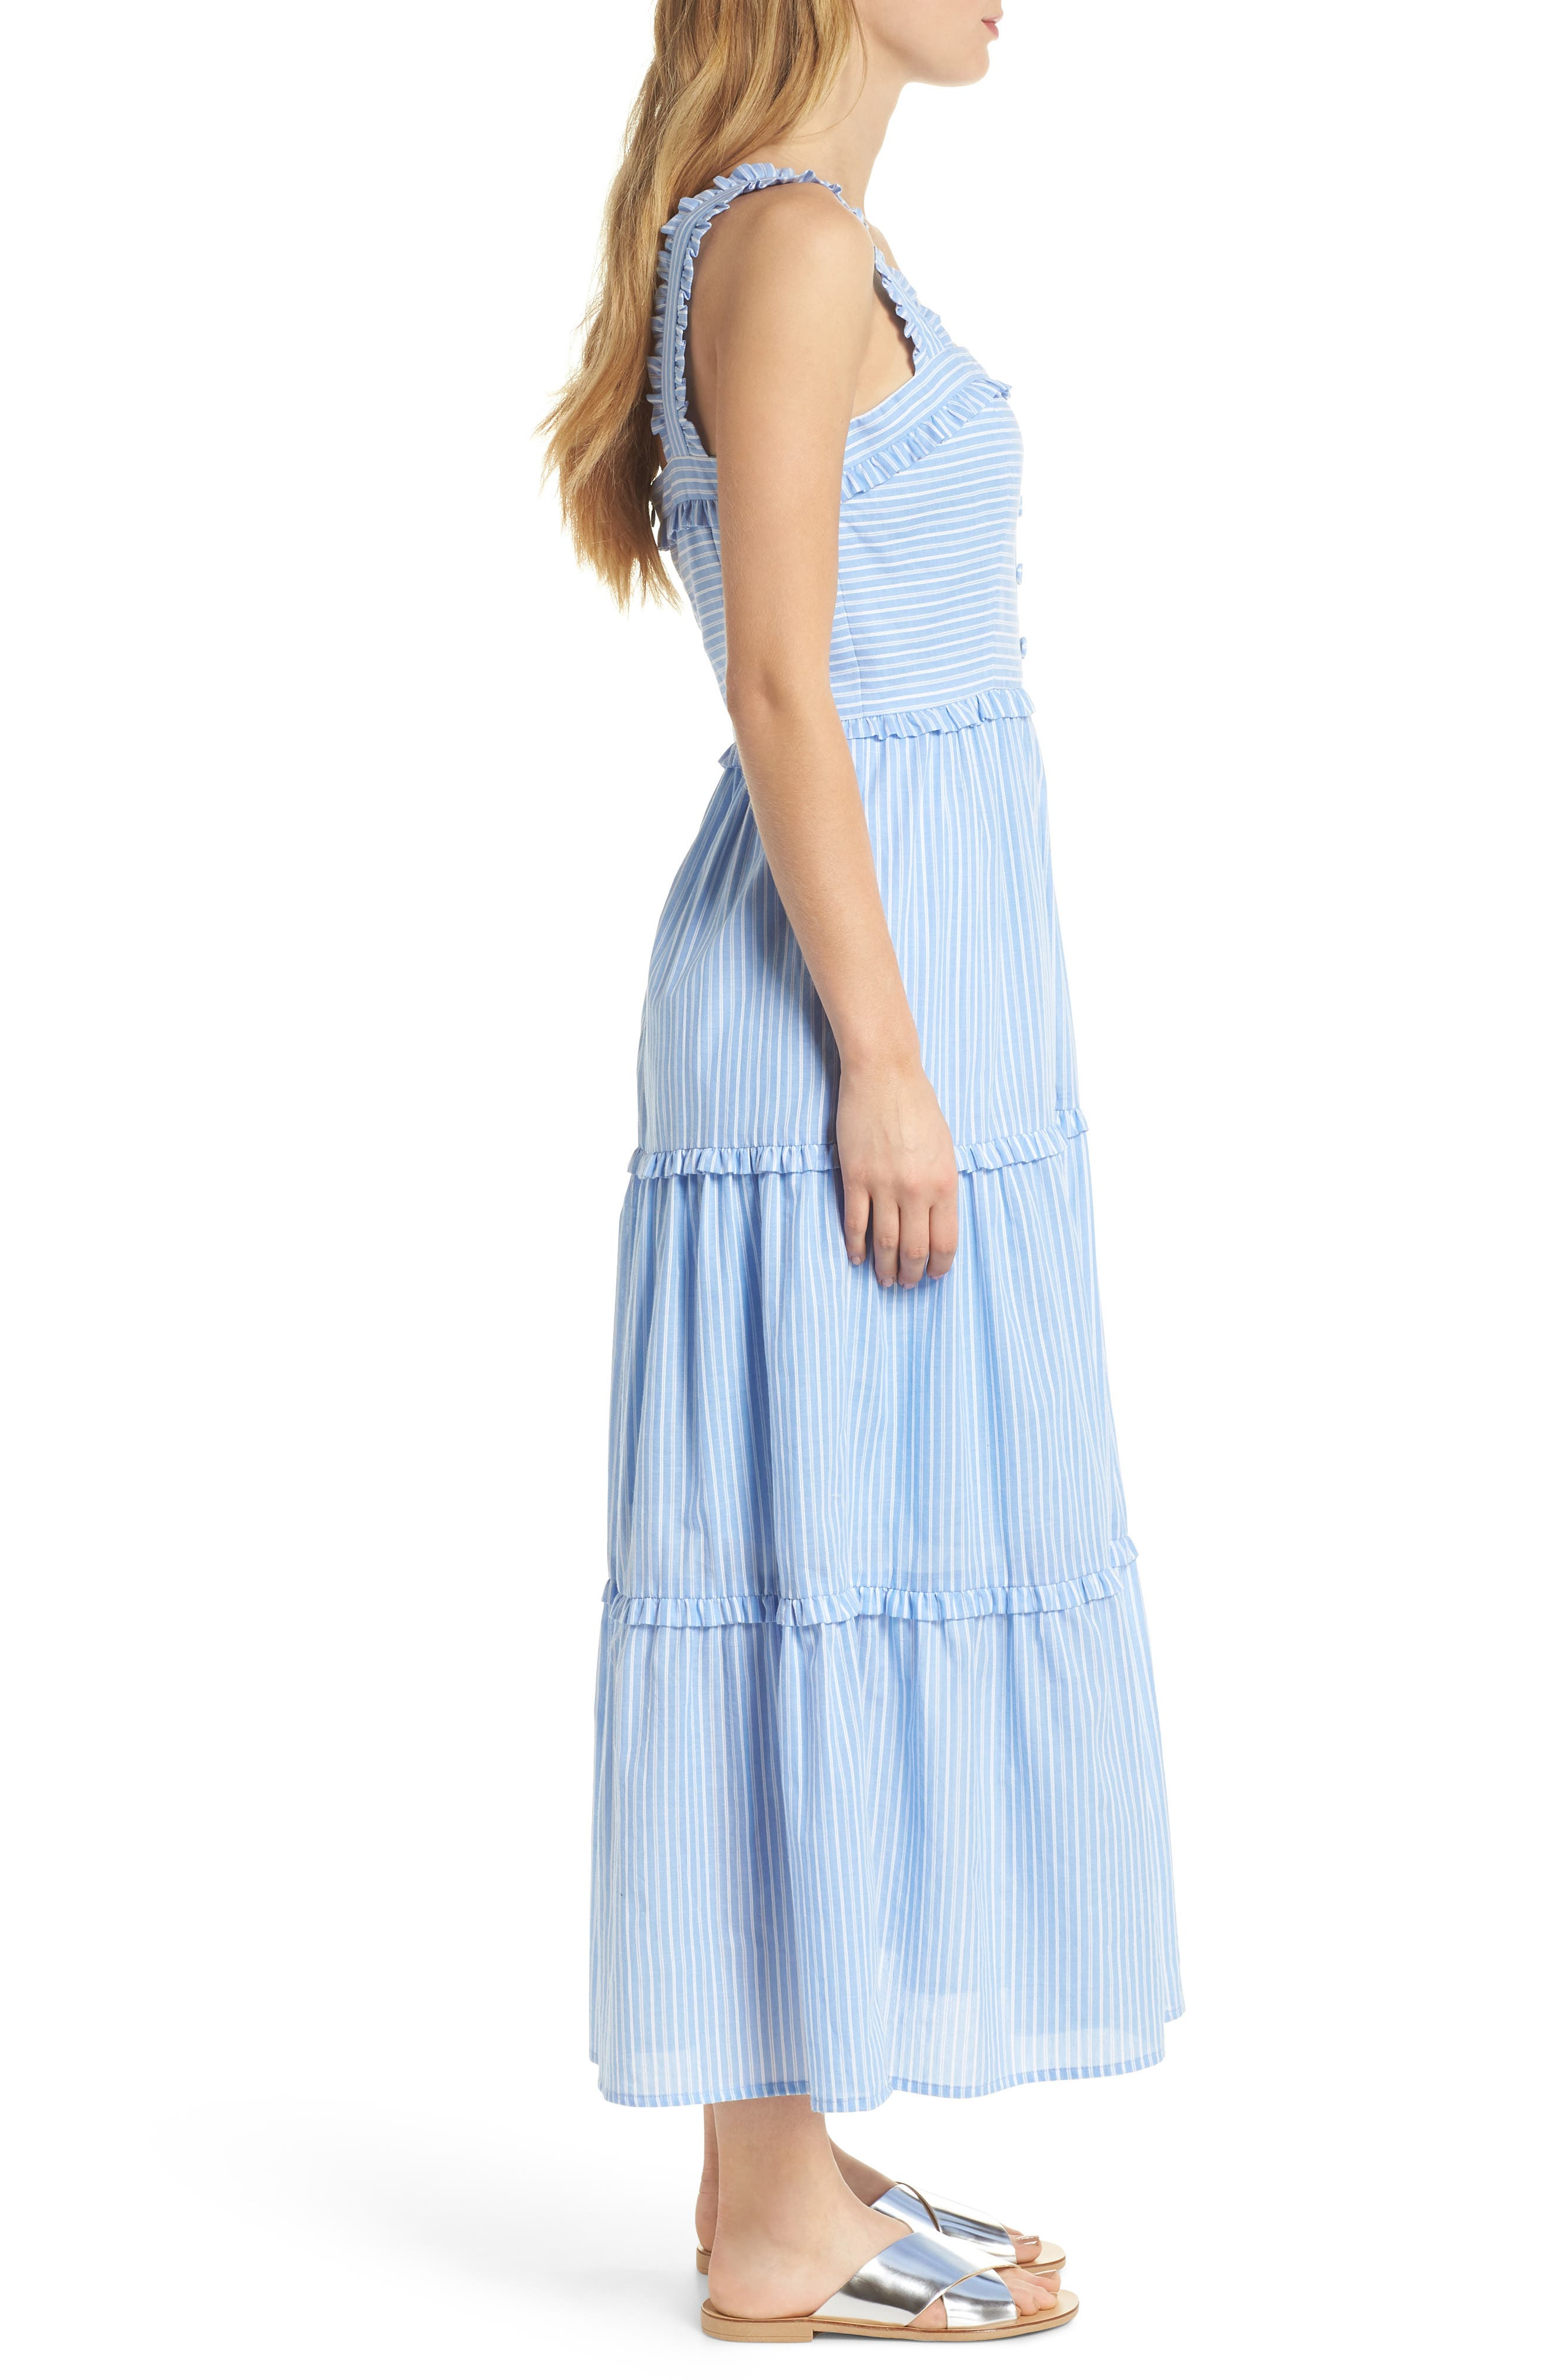 Courtney Rio Stripe Lawn Maxi Dress,                             Alternate thumbnail 4, color,                             Blue/ White